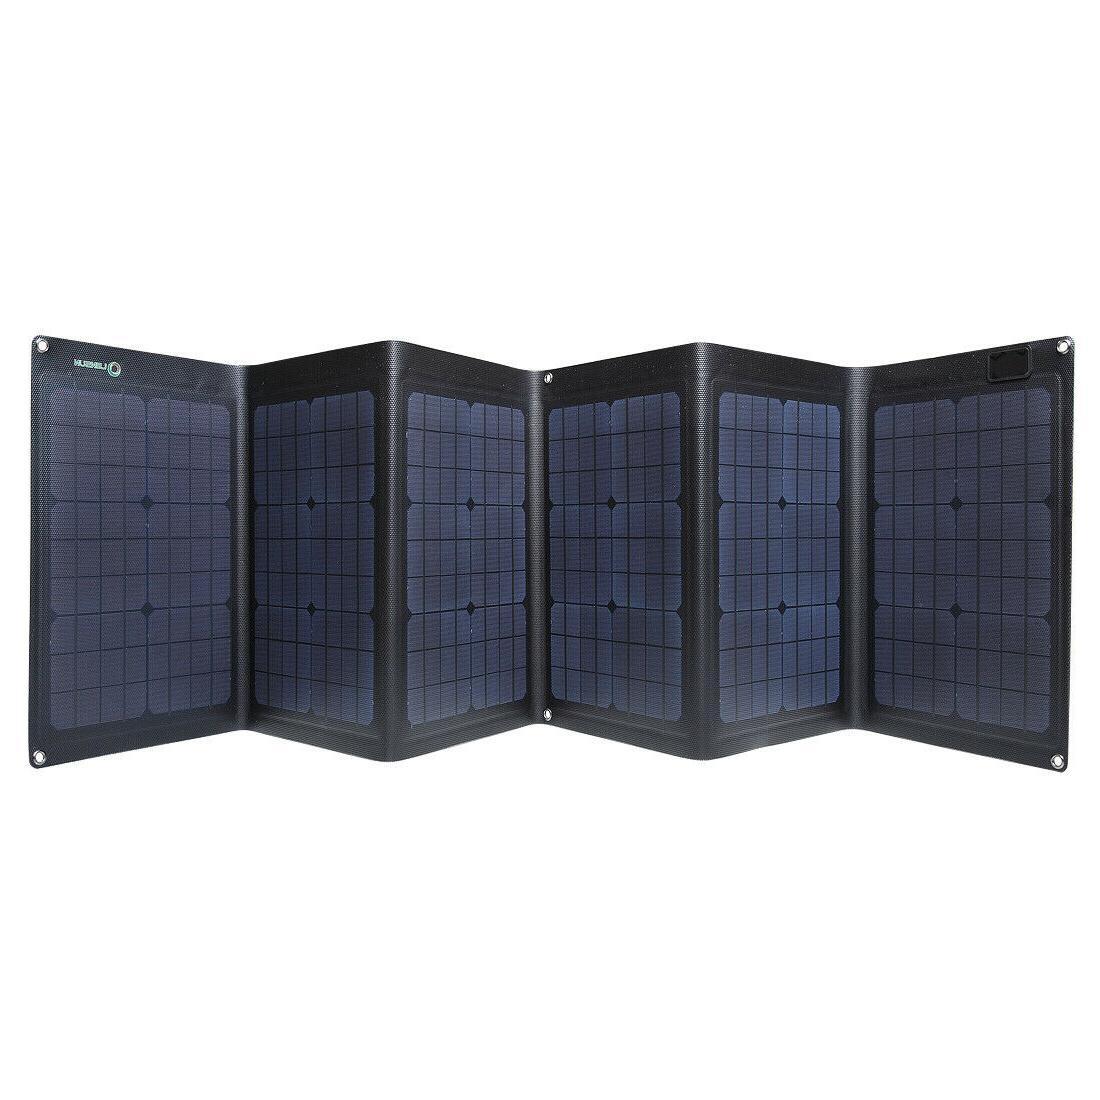 Lensun 100W Solar Laminated Technology